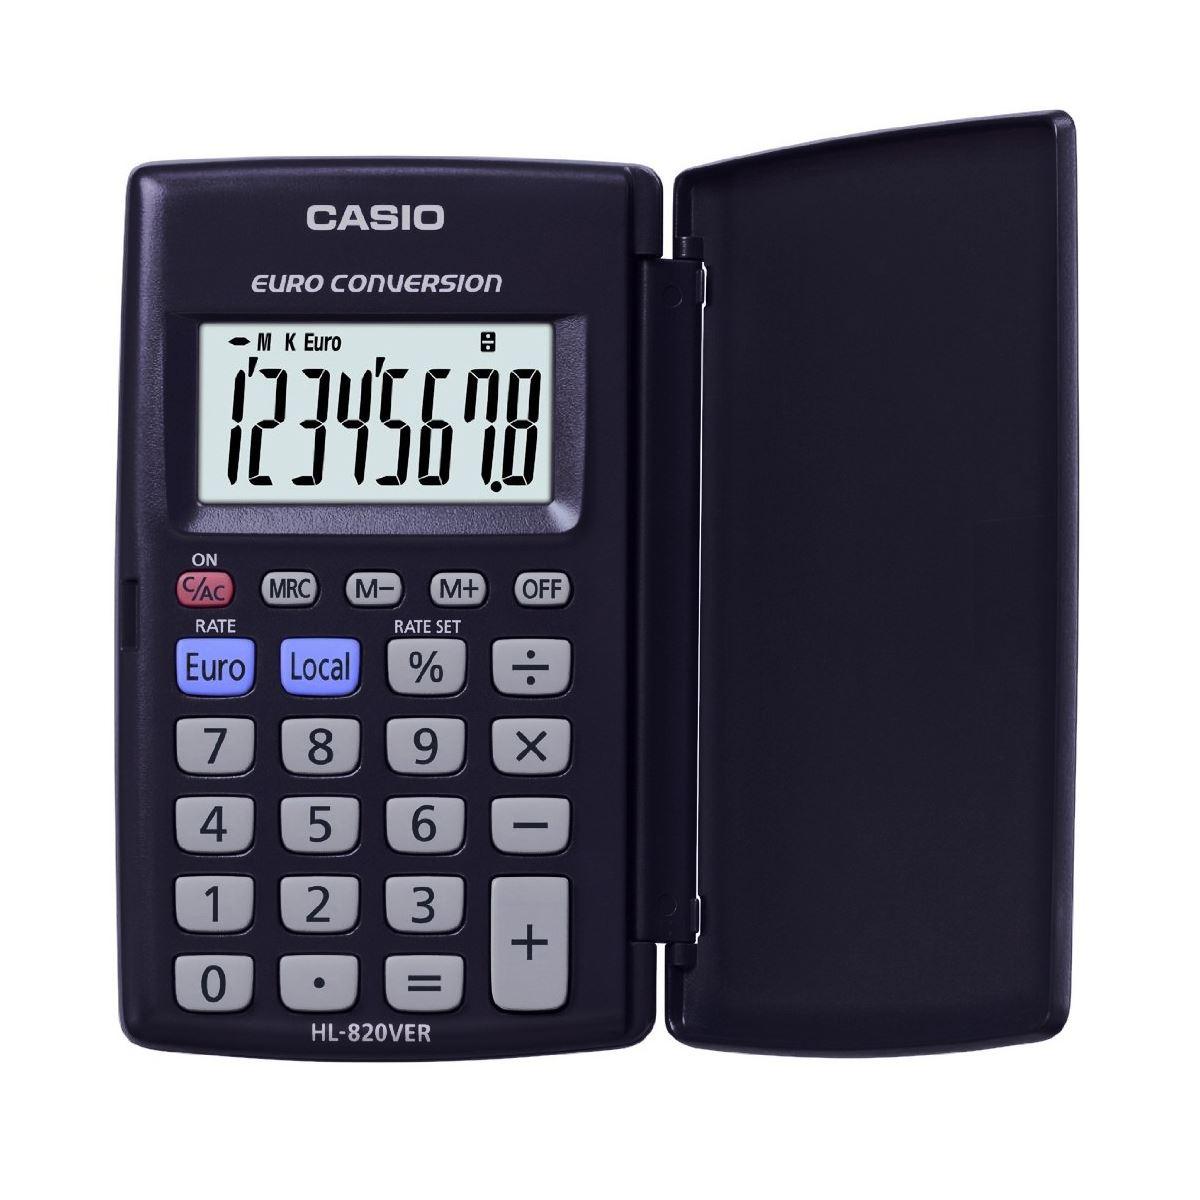 Wedding Gift Calculator Uk : Casio HL820VER 8-Digit Display Pocket Calculator With Euro Conversion ...